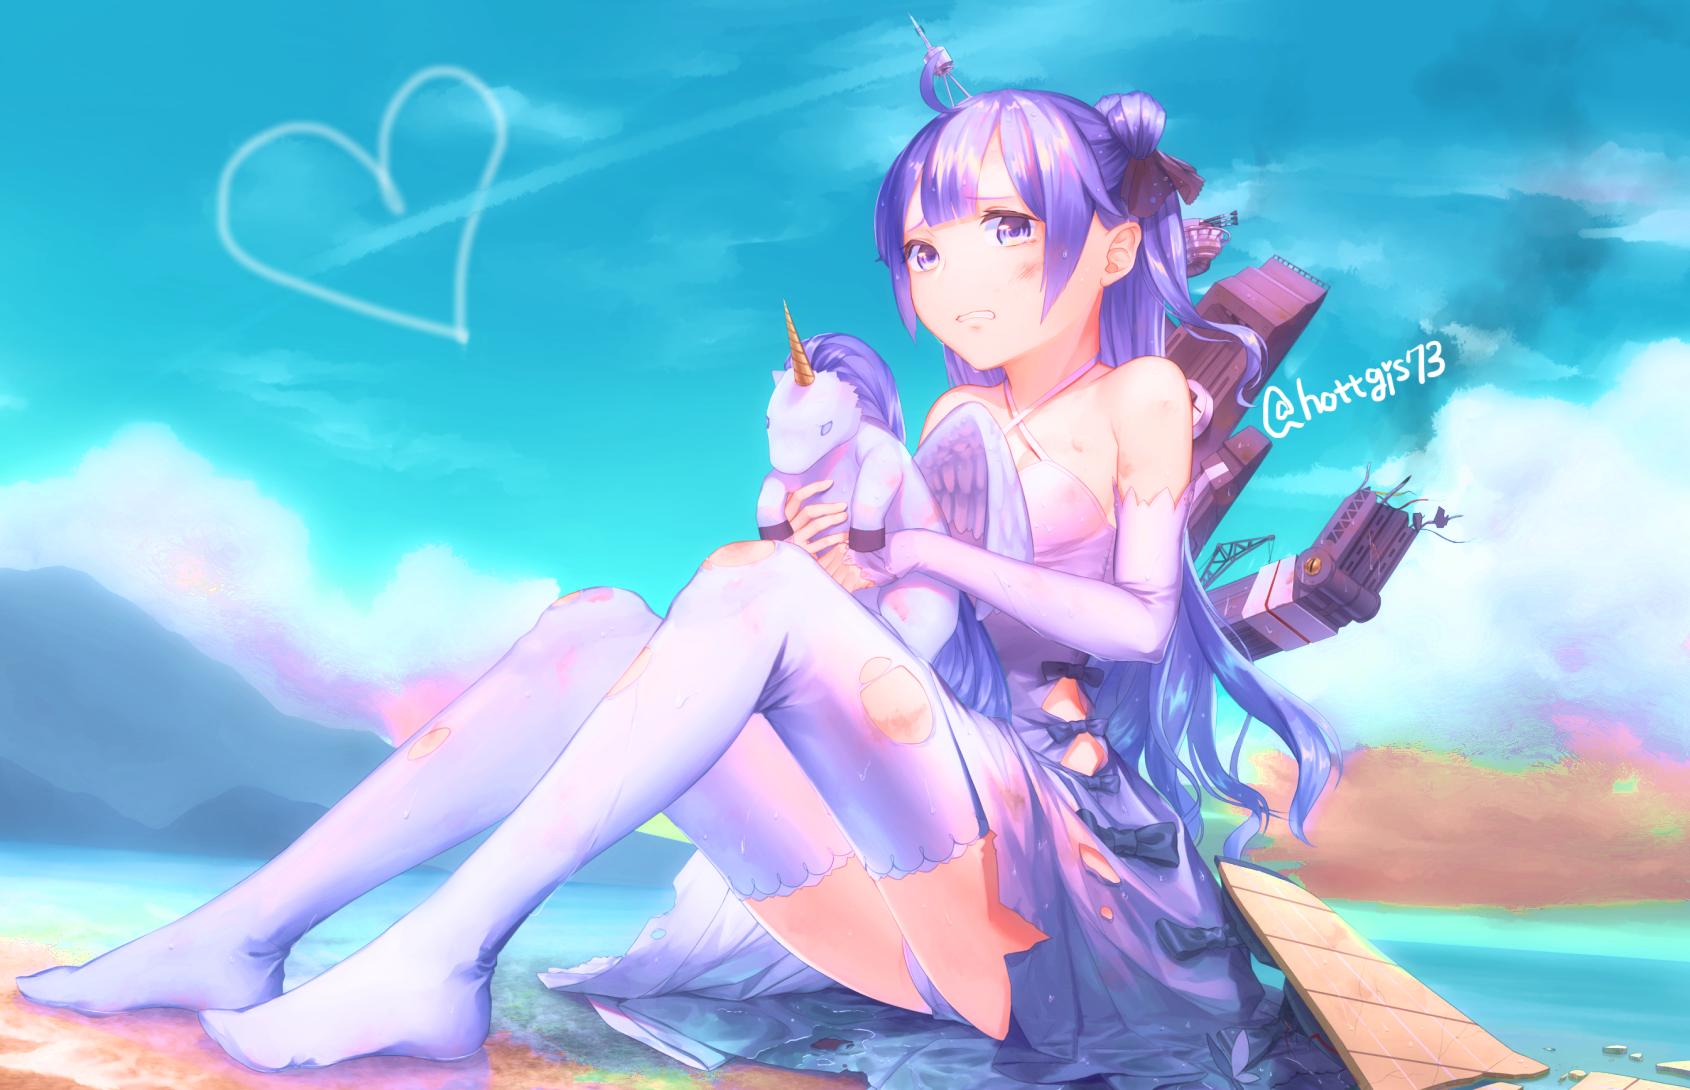 Unicorn 2334 Anime Wallpaper Anime Background Images